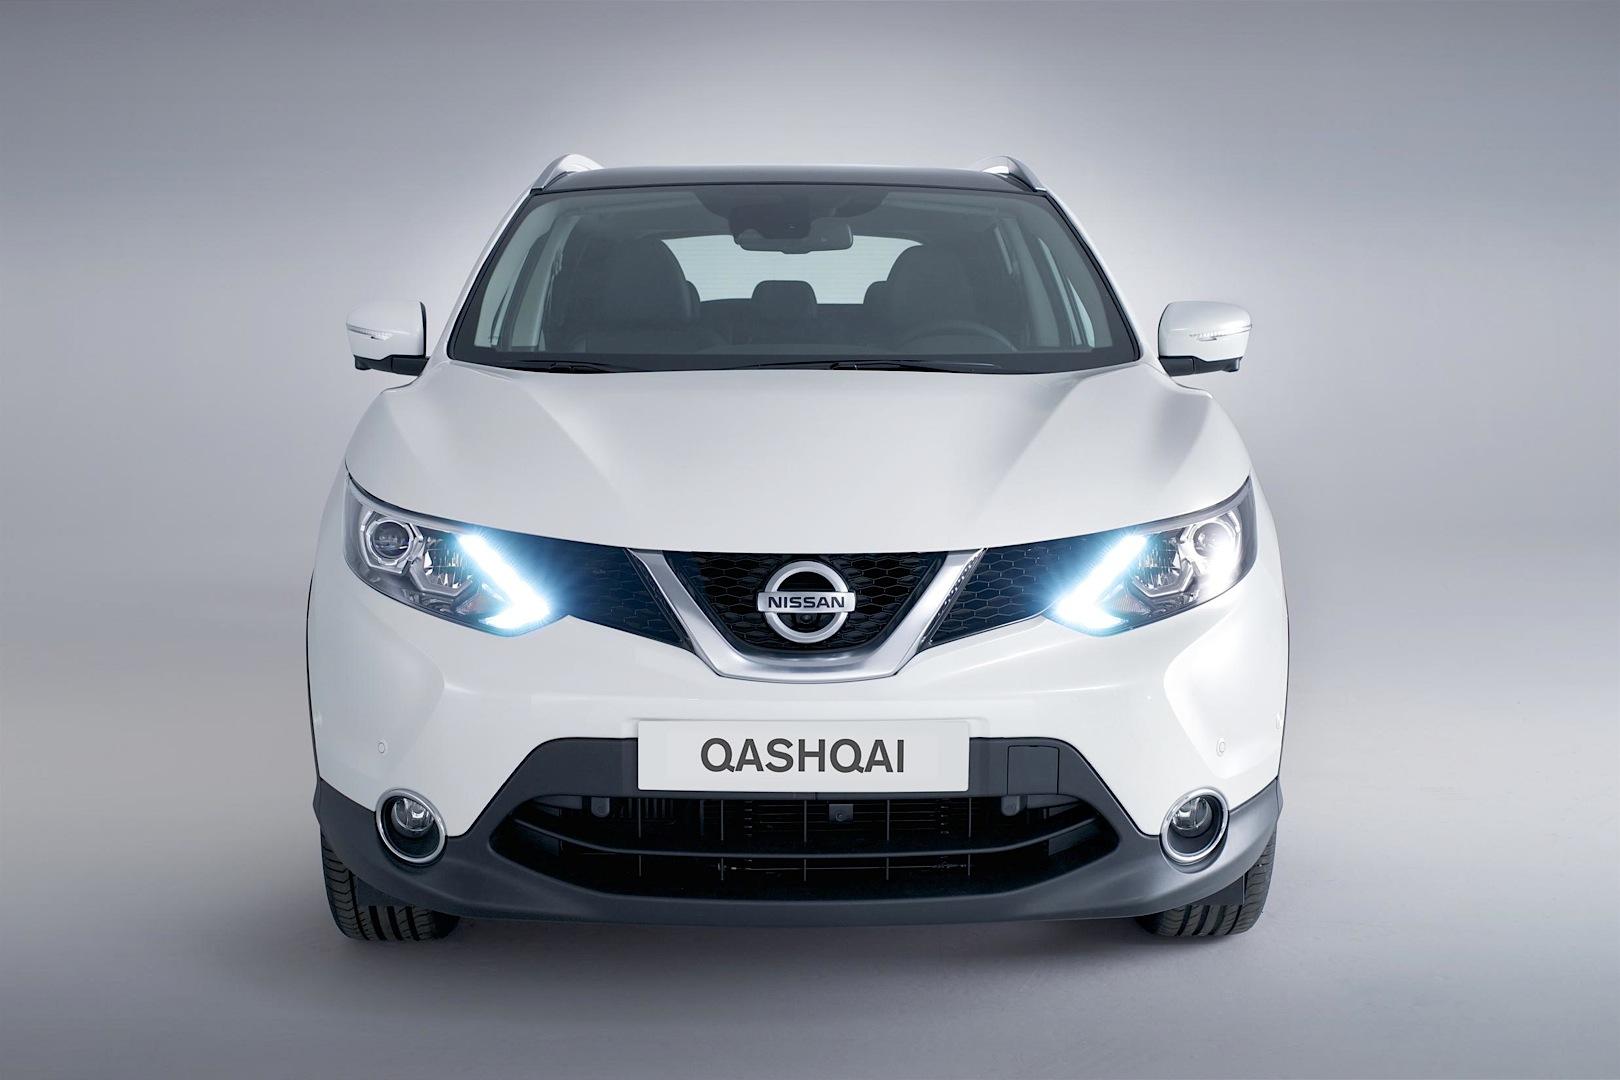 2014 Nissan Qashqai India Launch Expected Soon